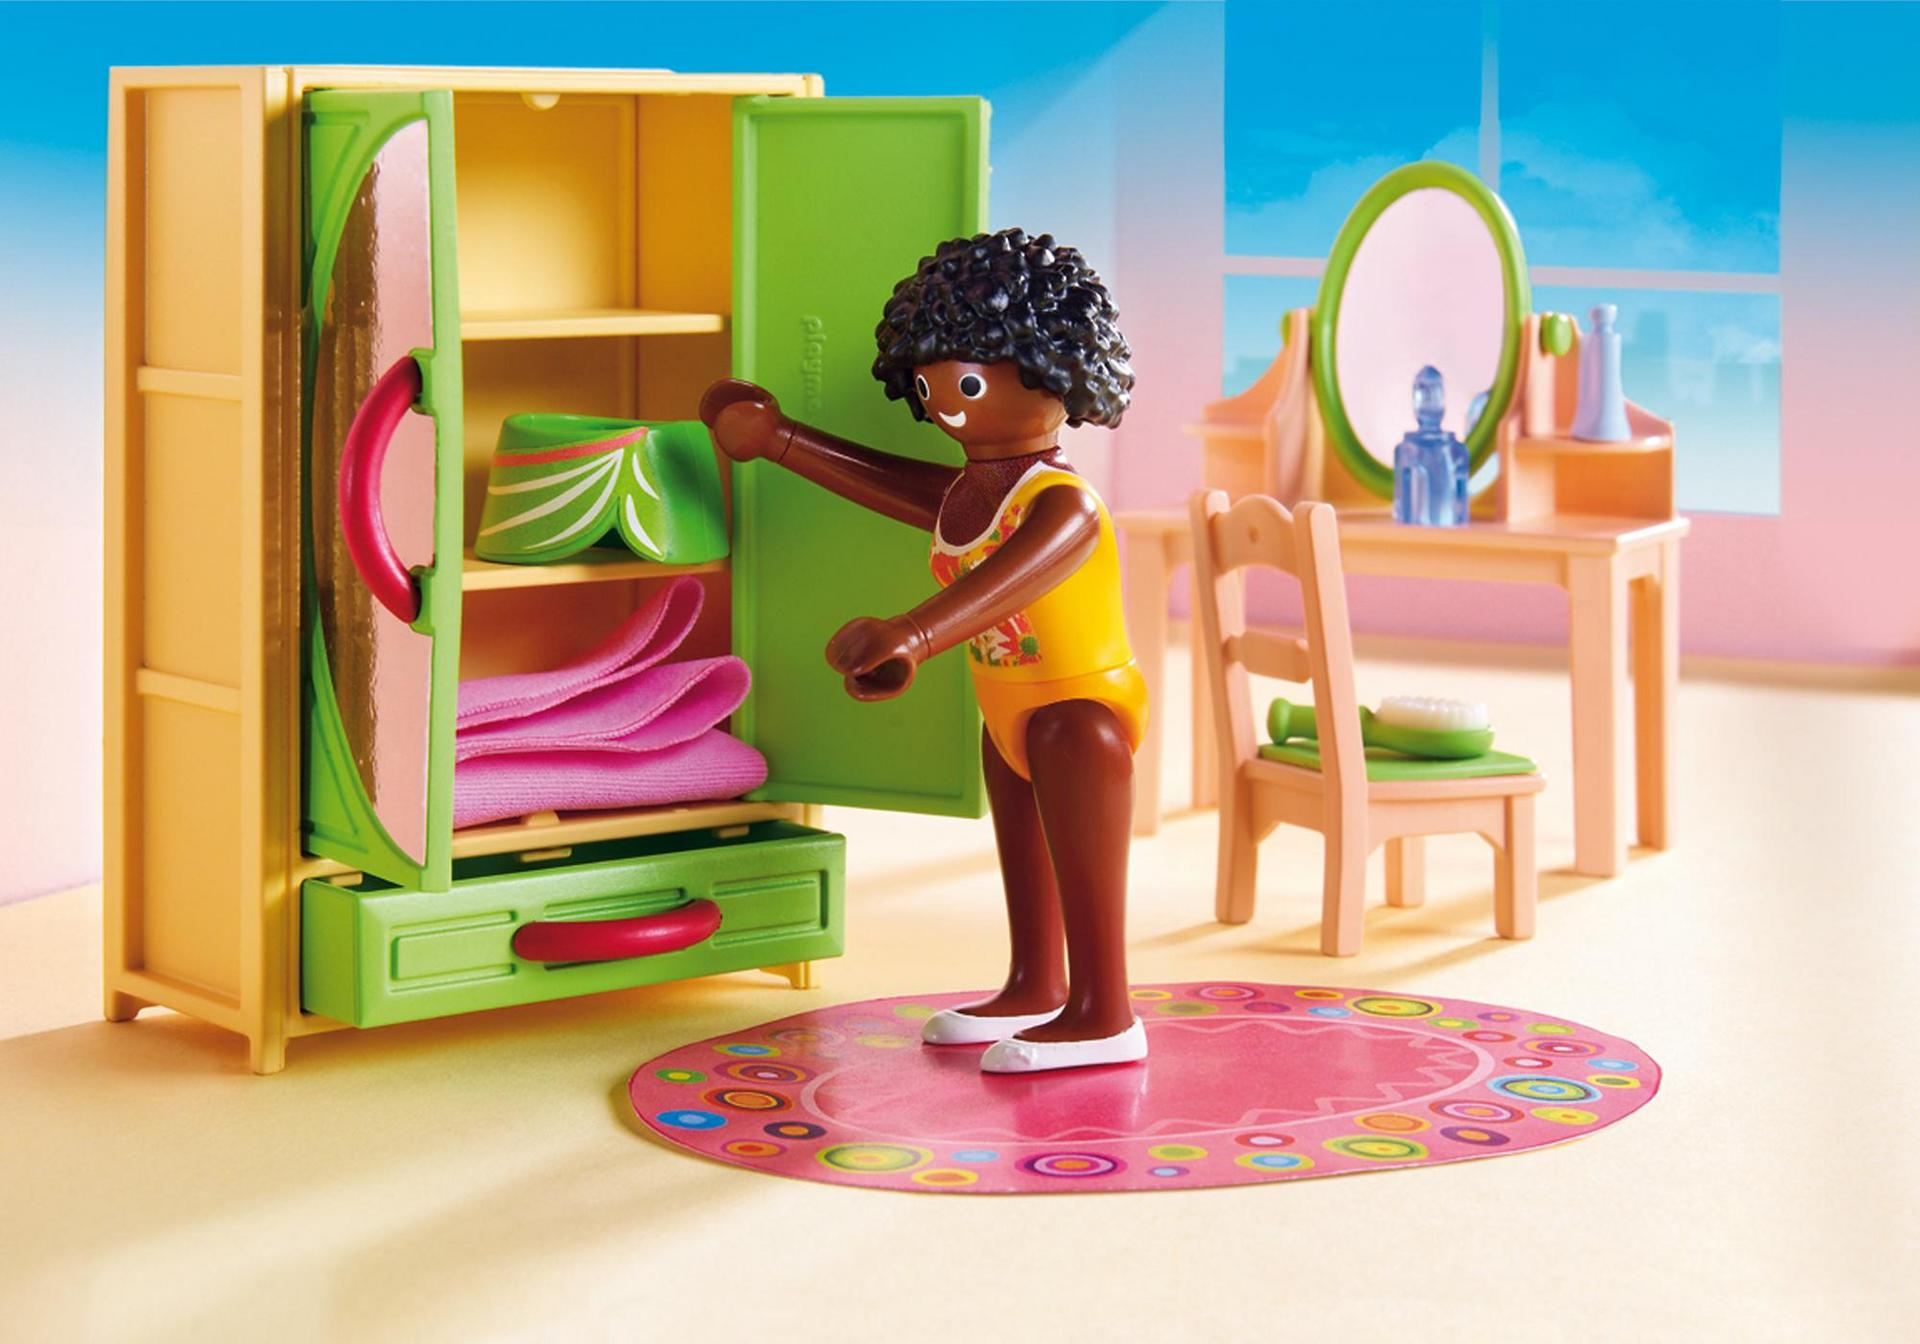 Master Bedroom 5309 Playmobil 174 Usa